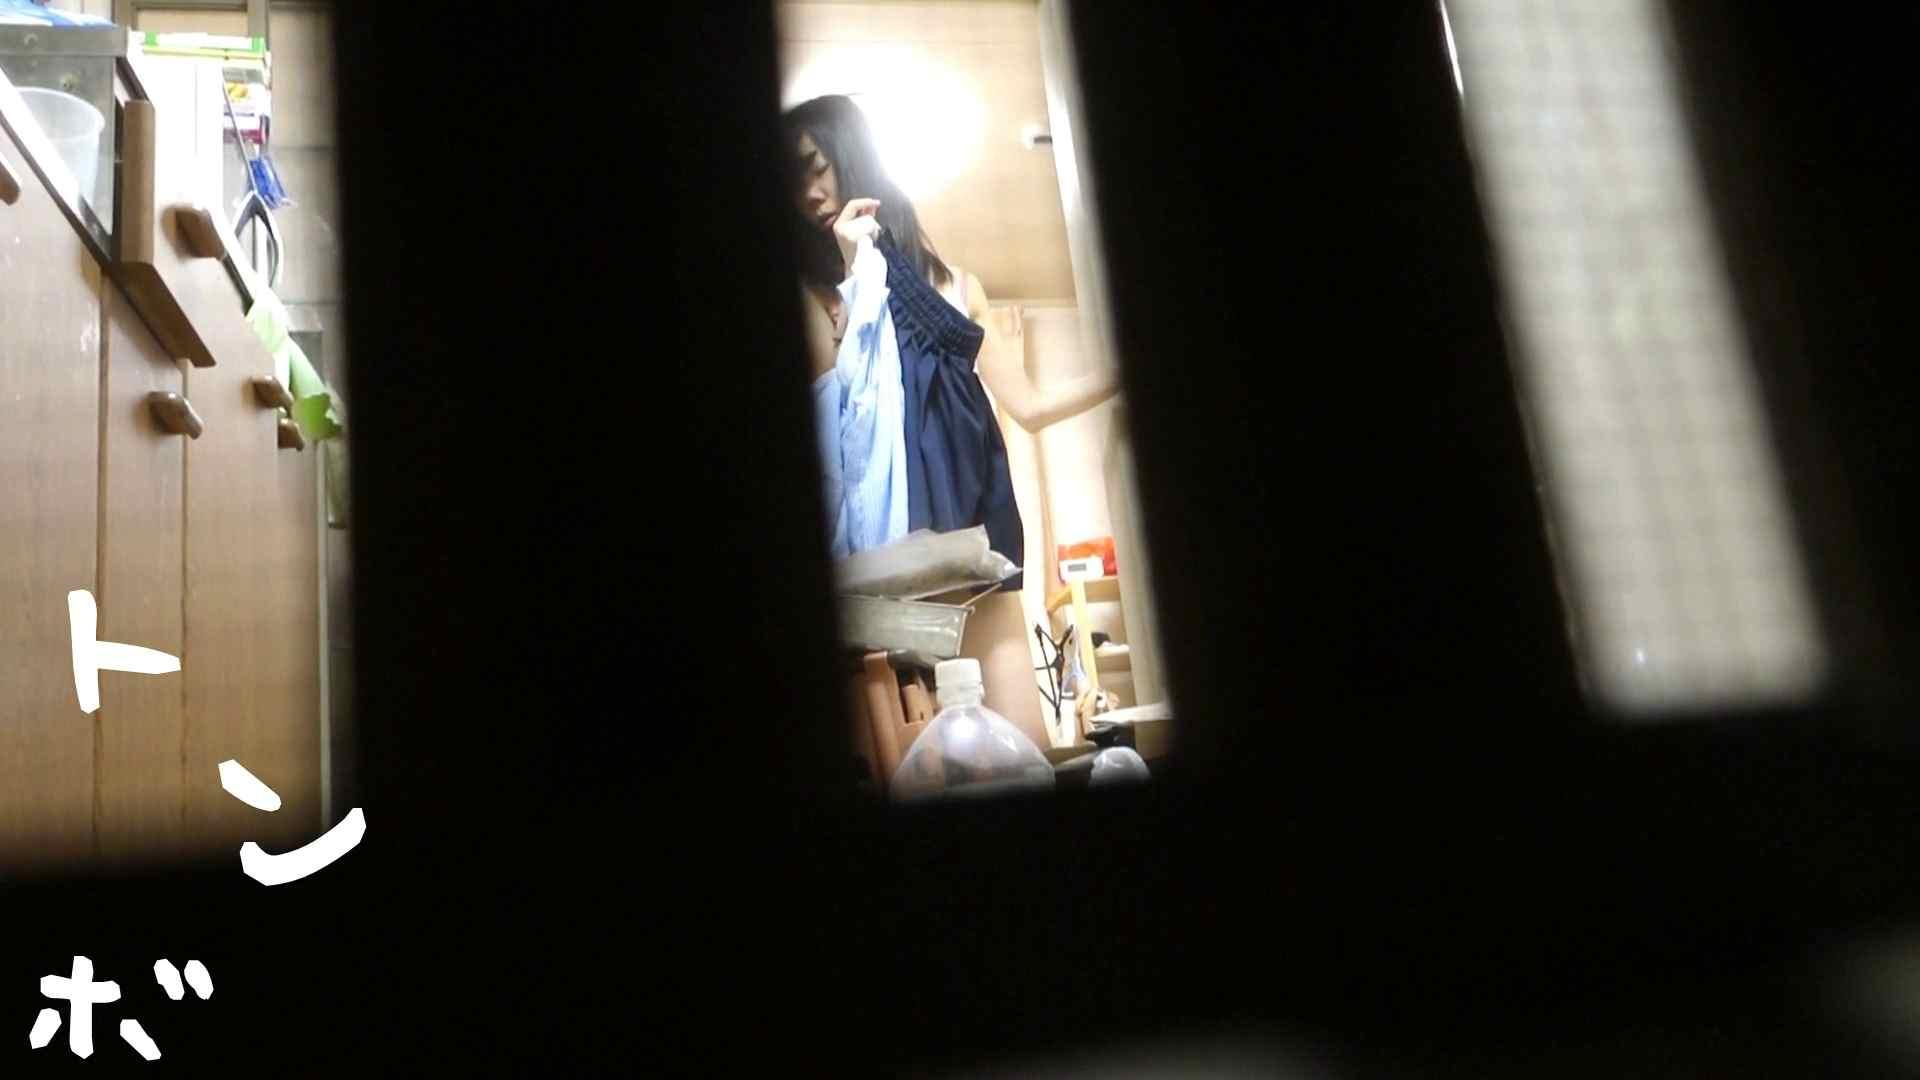 リアル盗撮 現役女子大生の私生活③ 盗撮映像大放出 オマンコ無修正動画無料 27連発 7